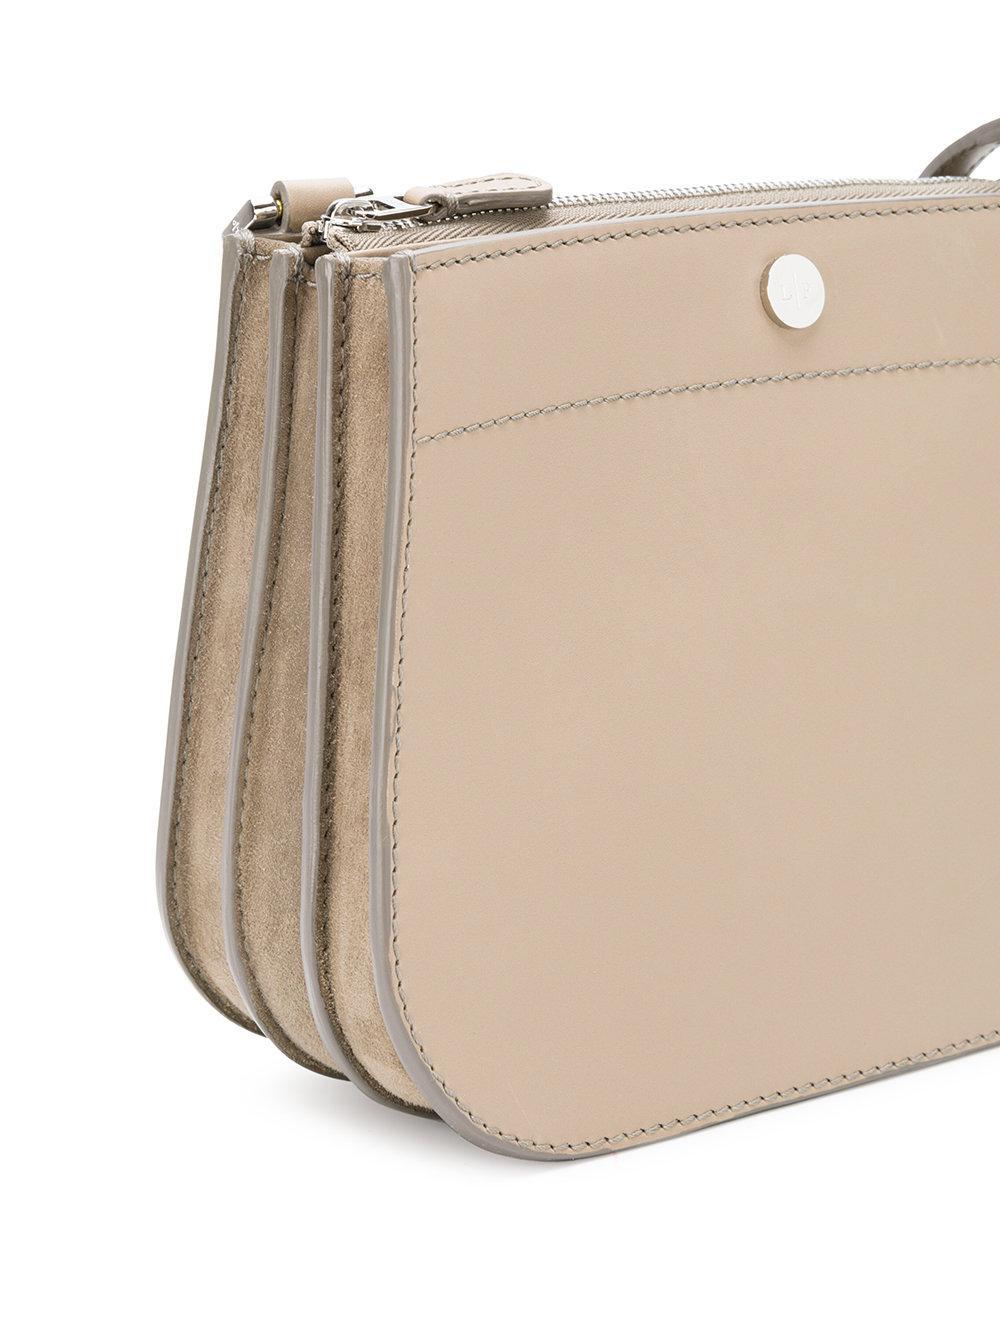 Loro Piana Leather Milky Way Crossbody Bag in Natural